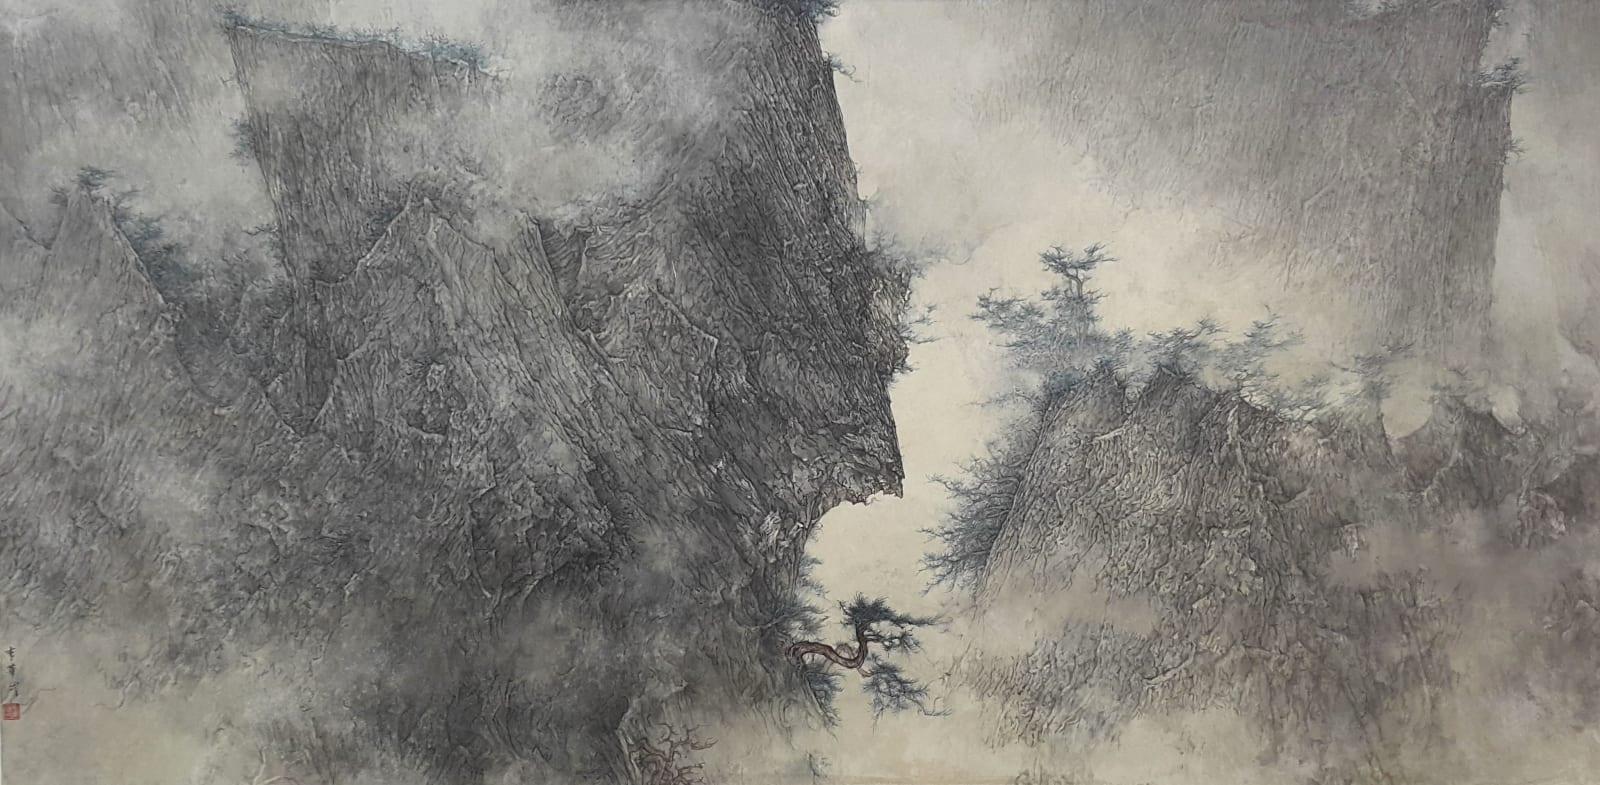 Li Huayi 李華弌, Greenish Ridges 《青峰疊嶂》, 2016